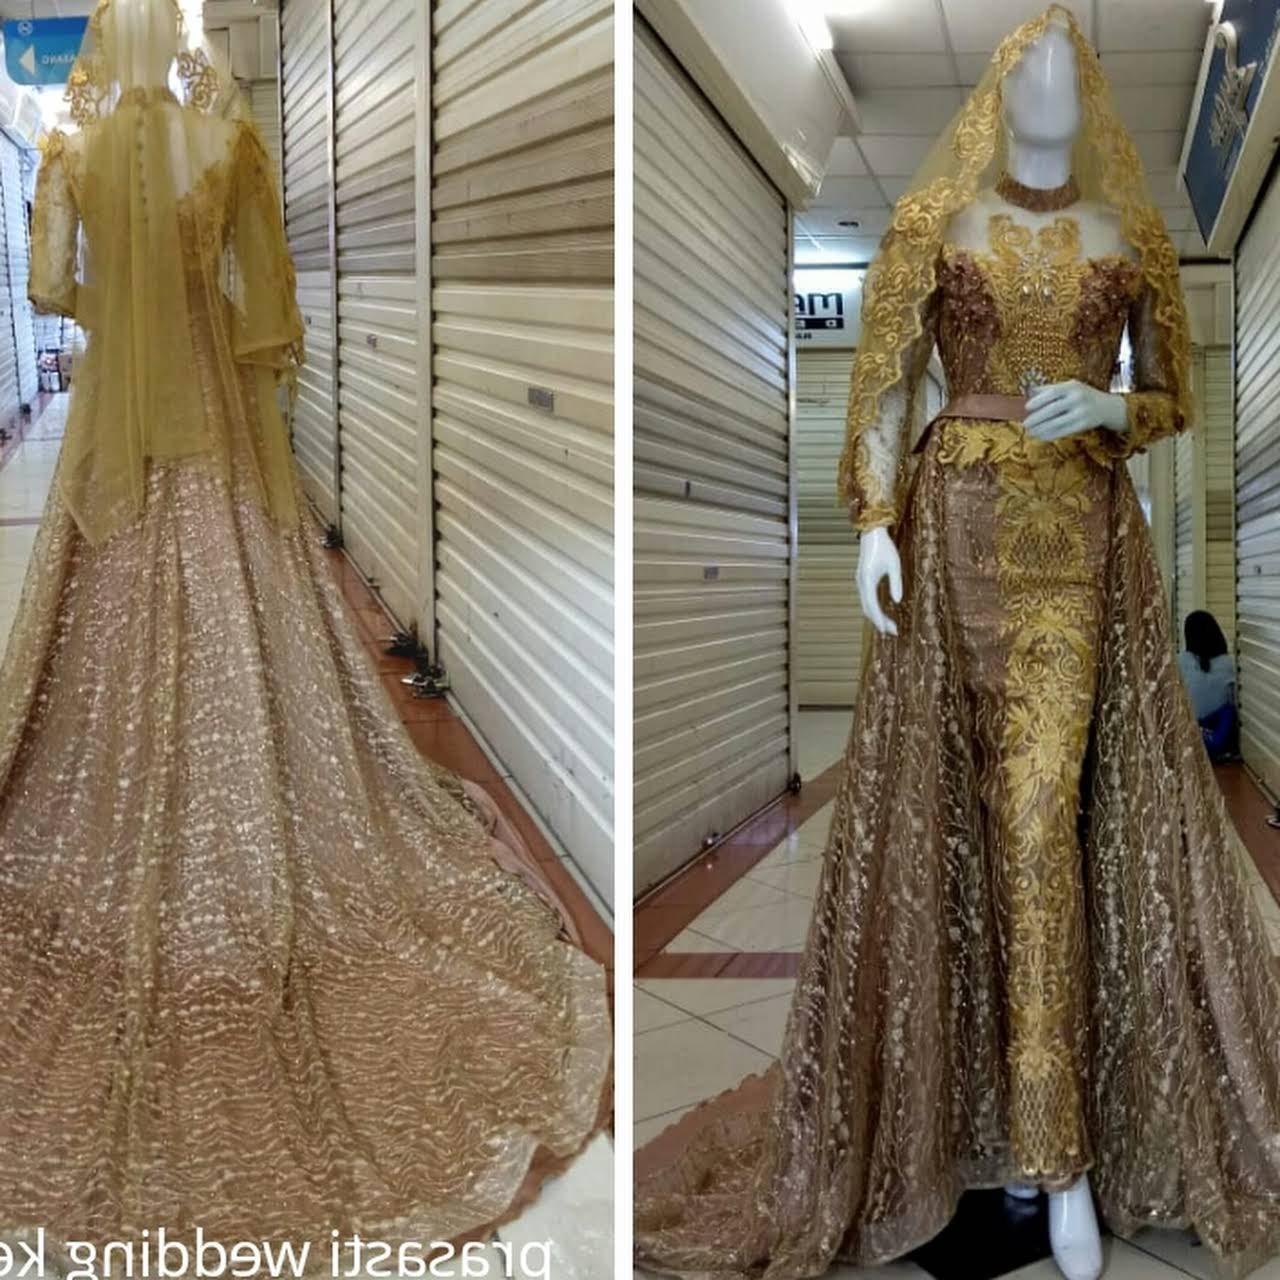 Model Harga Sewa Baju Pengantin Muslimah J7do Gaun Kebaya Pengantin Muslimah Hijab Syari Layanan Belanja